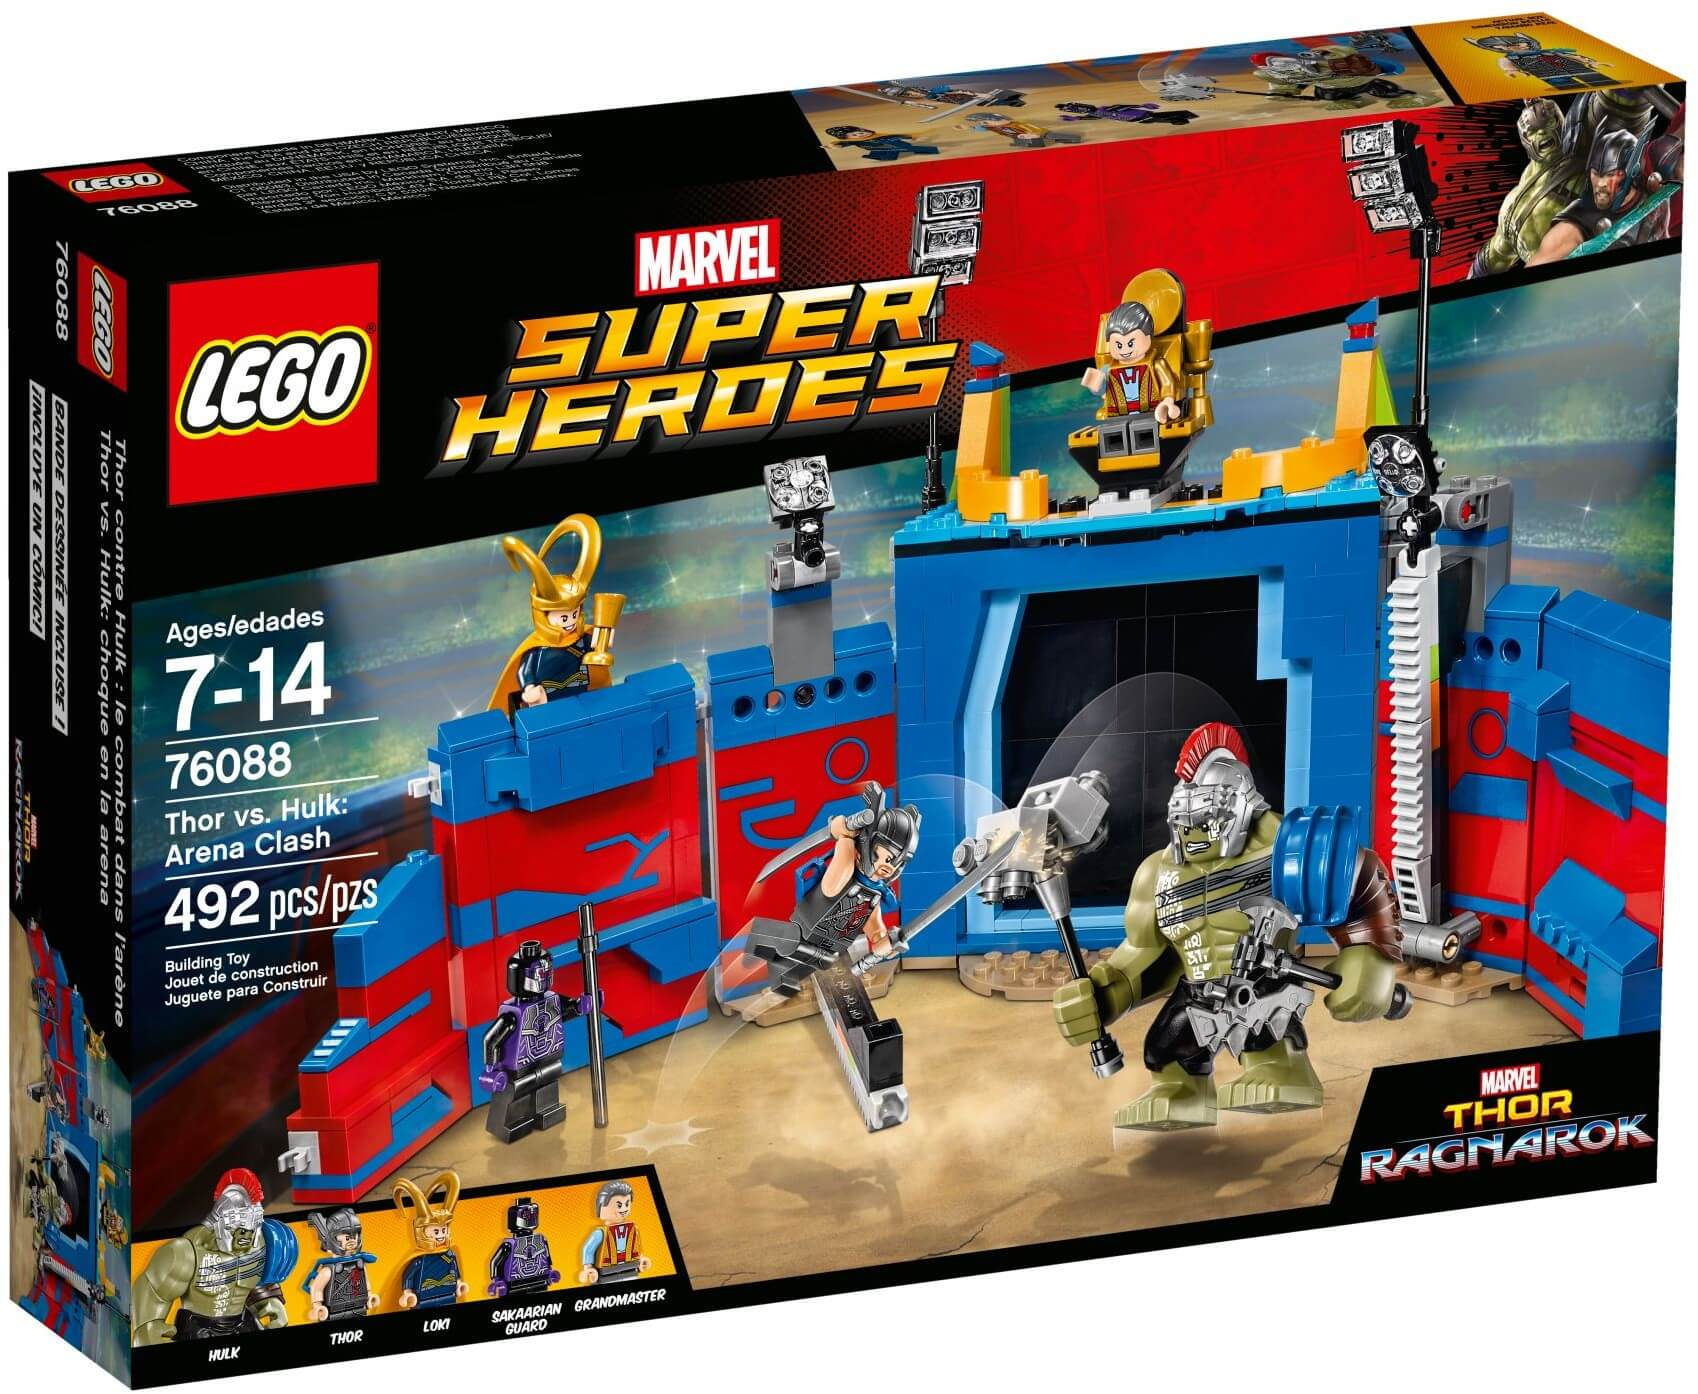 Mua đồ chơi LEGO 76088 - LEGO Marvel Super Heroes 76088 - Đại chiến giữa Thor và Hulk (LEGO Marvel Super Heroes Thor vs. Hulk: Arena Clash)